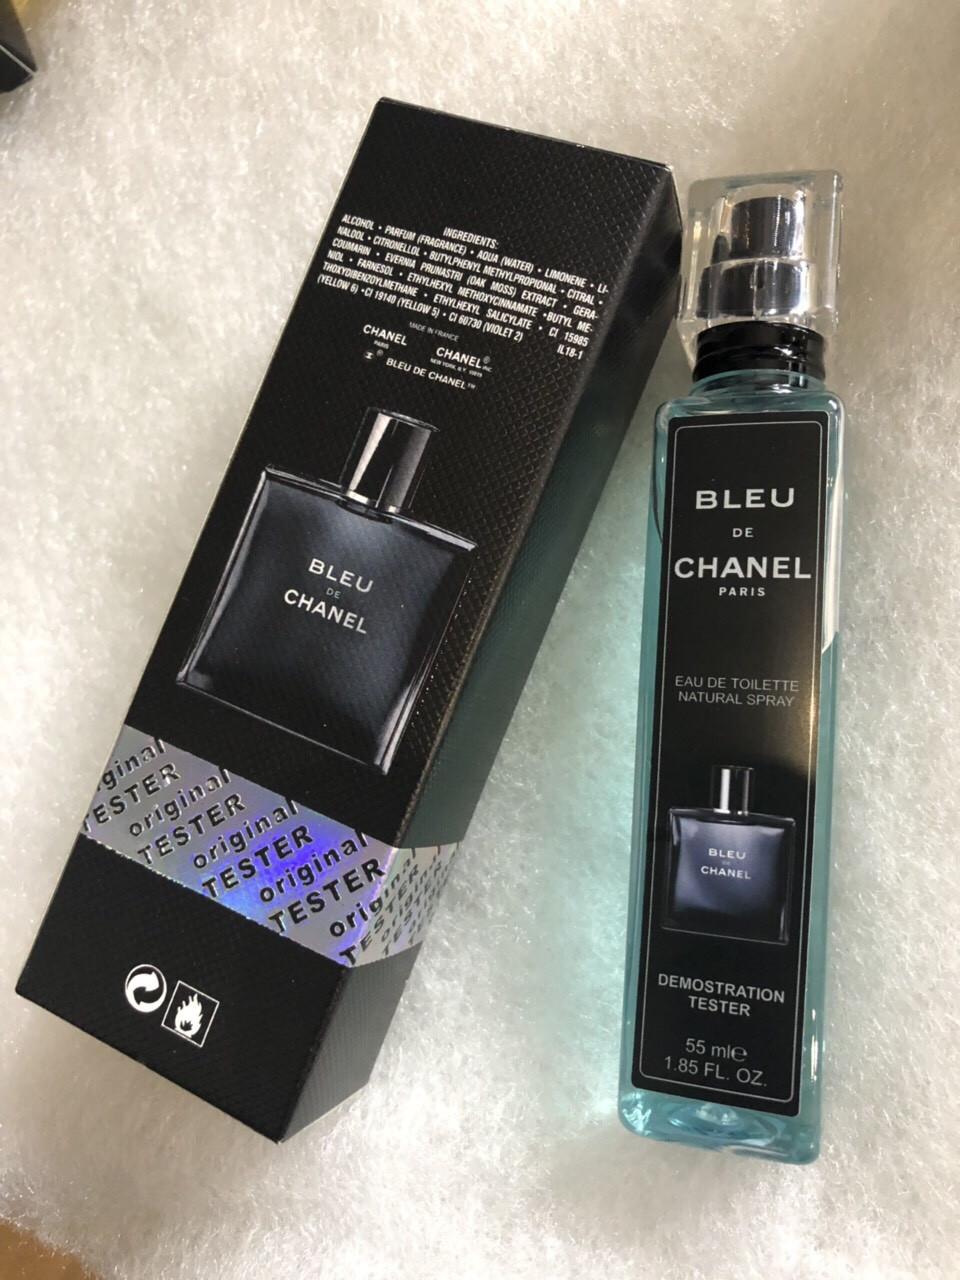 Chanel Bleu de Chanel мужской парфюм тестер 55 ml (реплика)